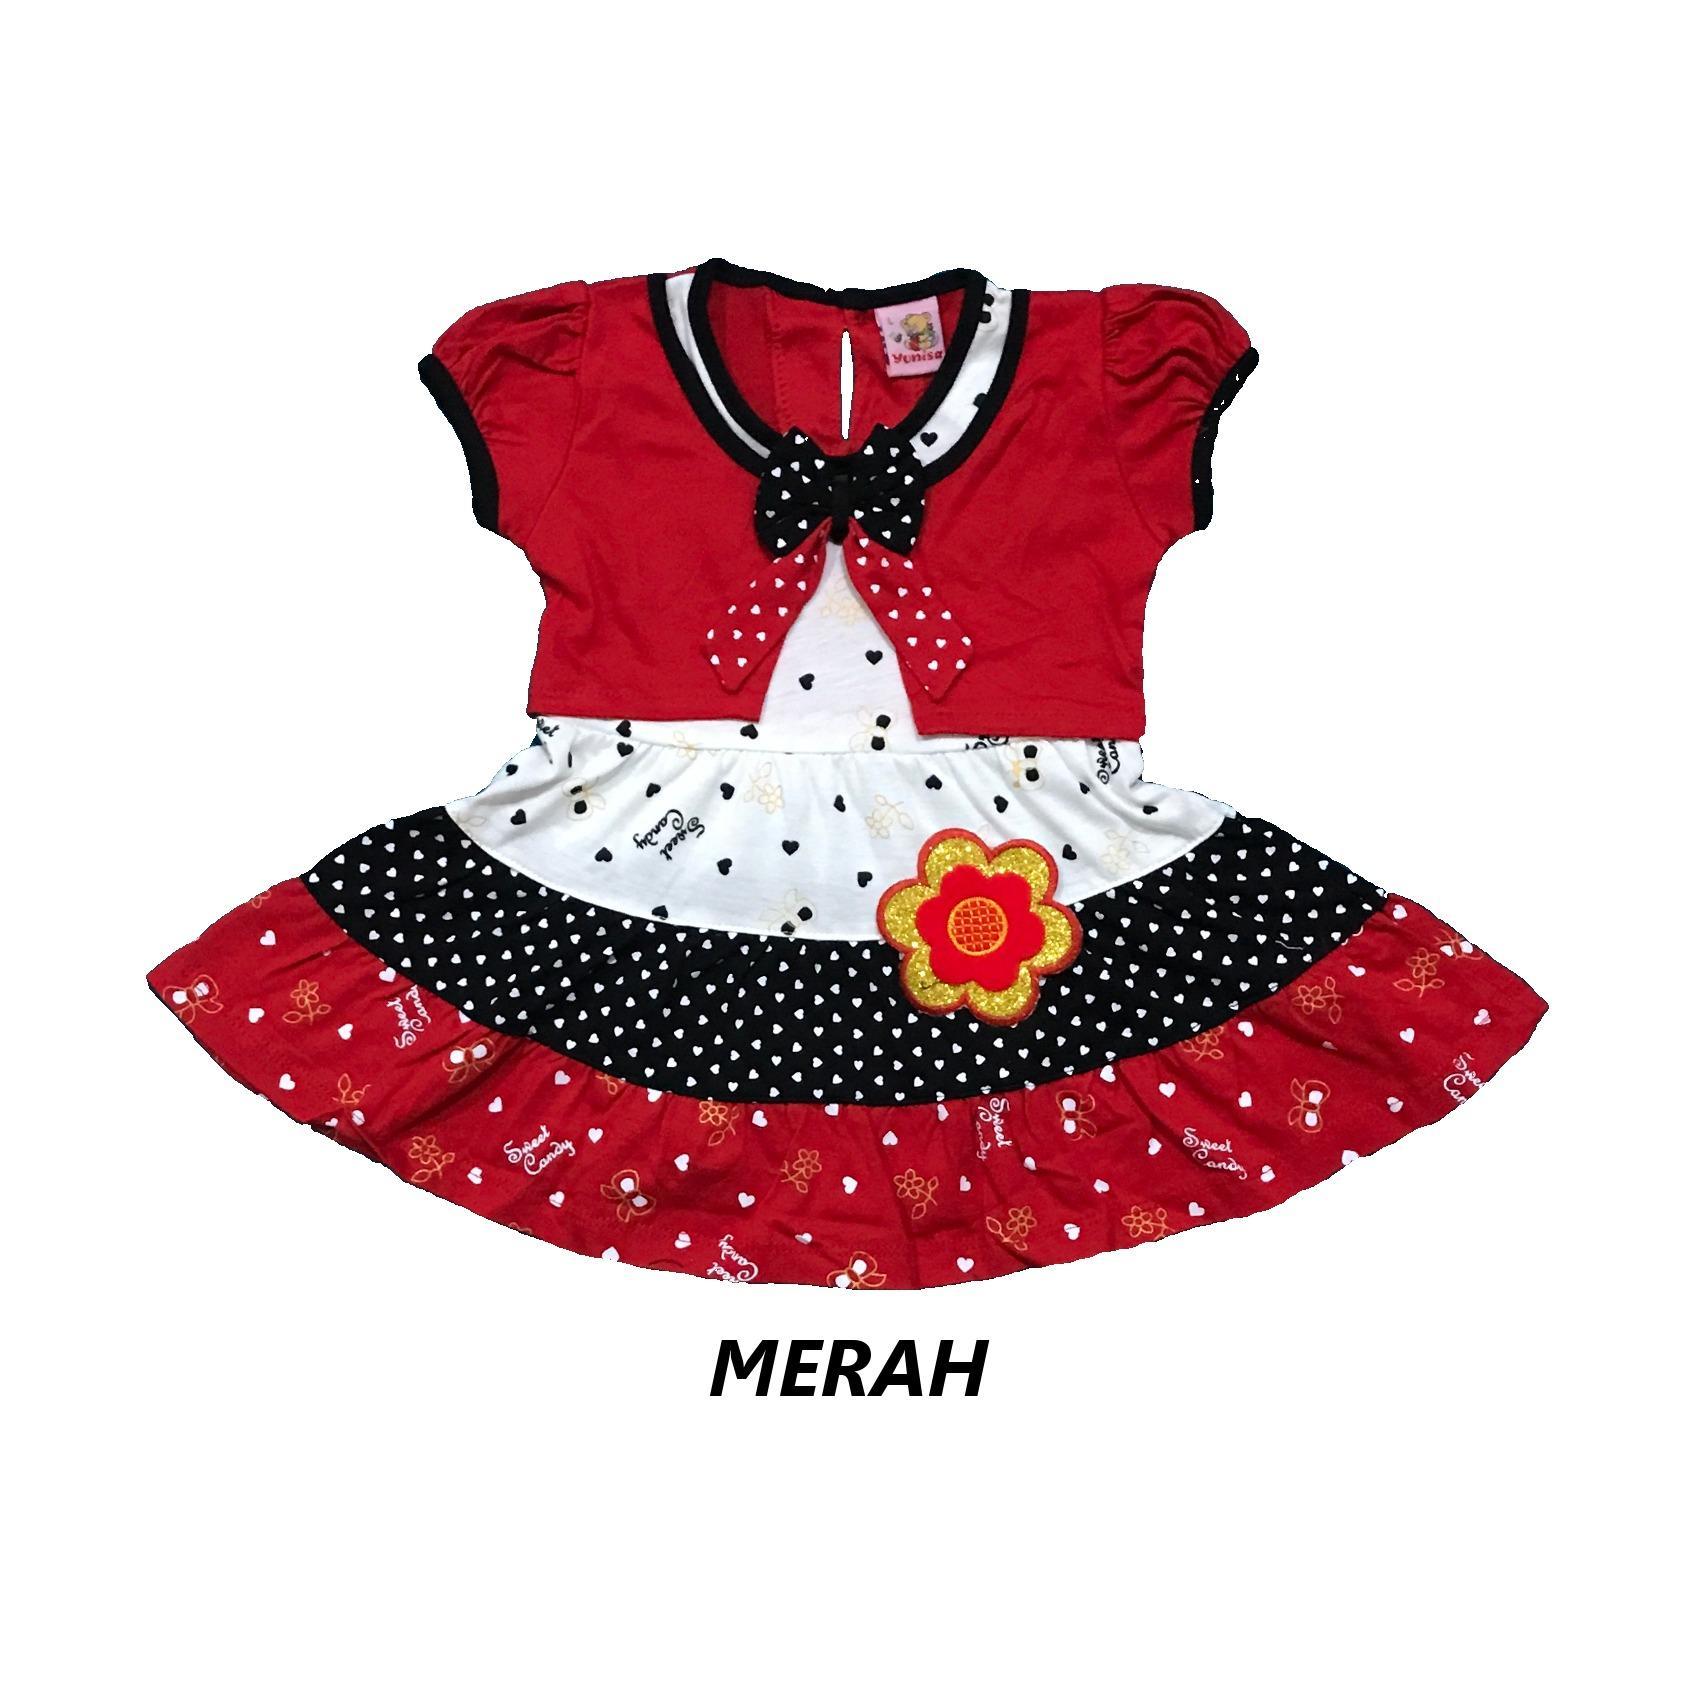 BAYIe - Setelan Baju Bayi Dress Perempuan motif BUNGA YUNISA / Pakaian anak cewek umur 1 - 2 tahun